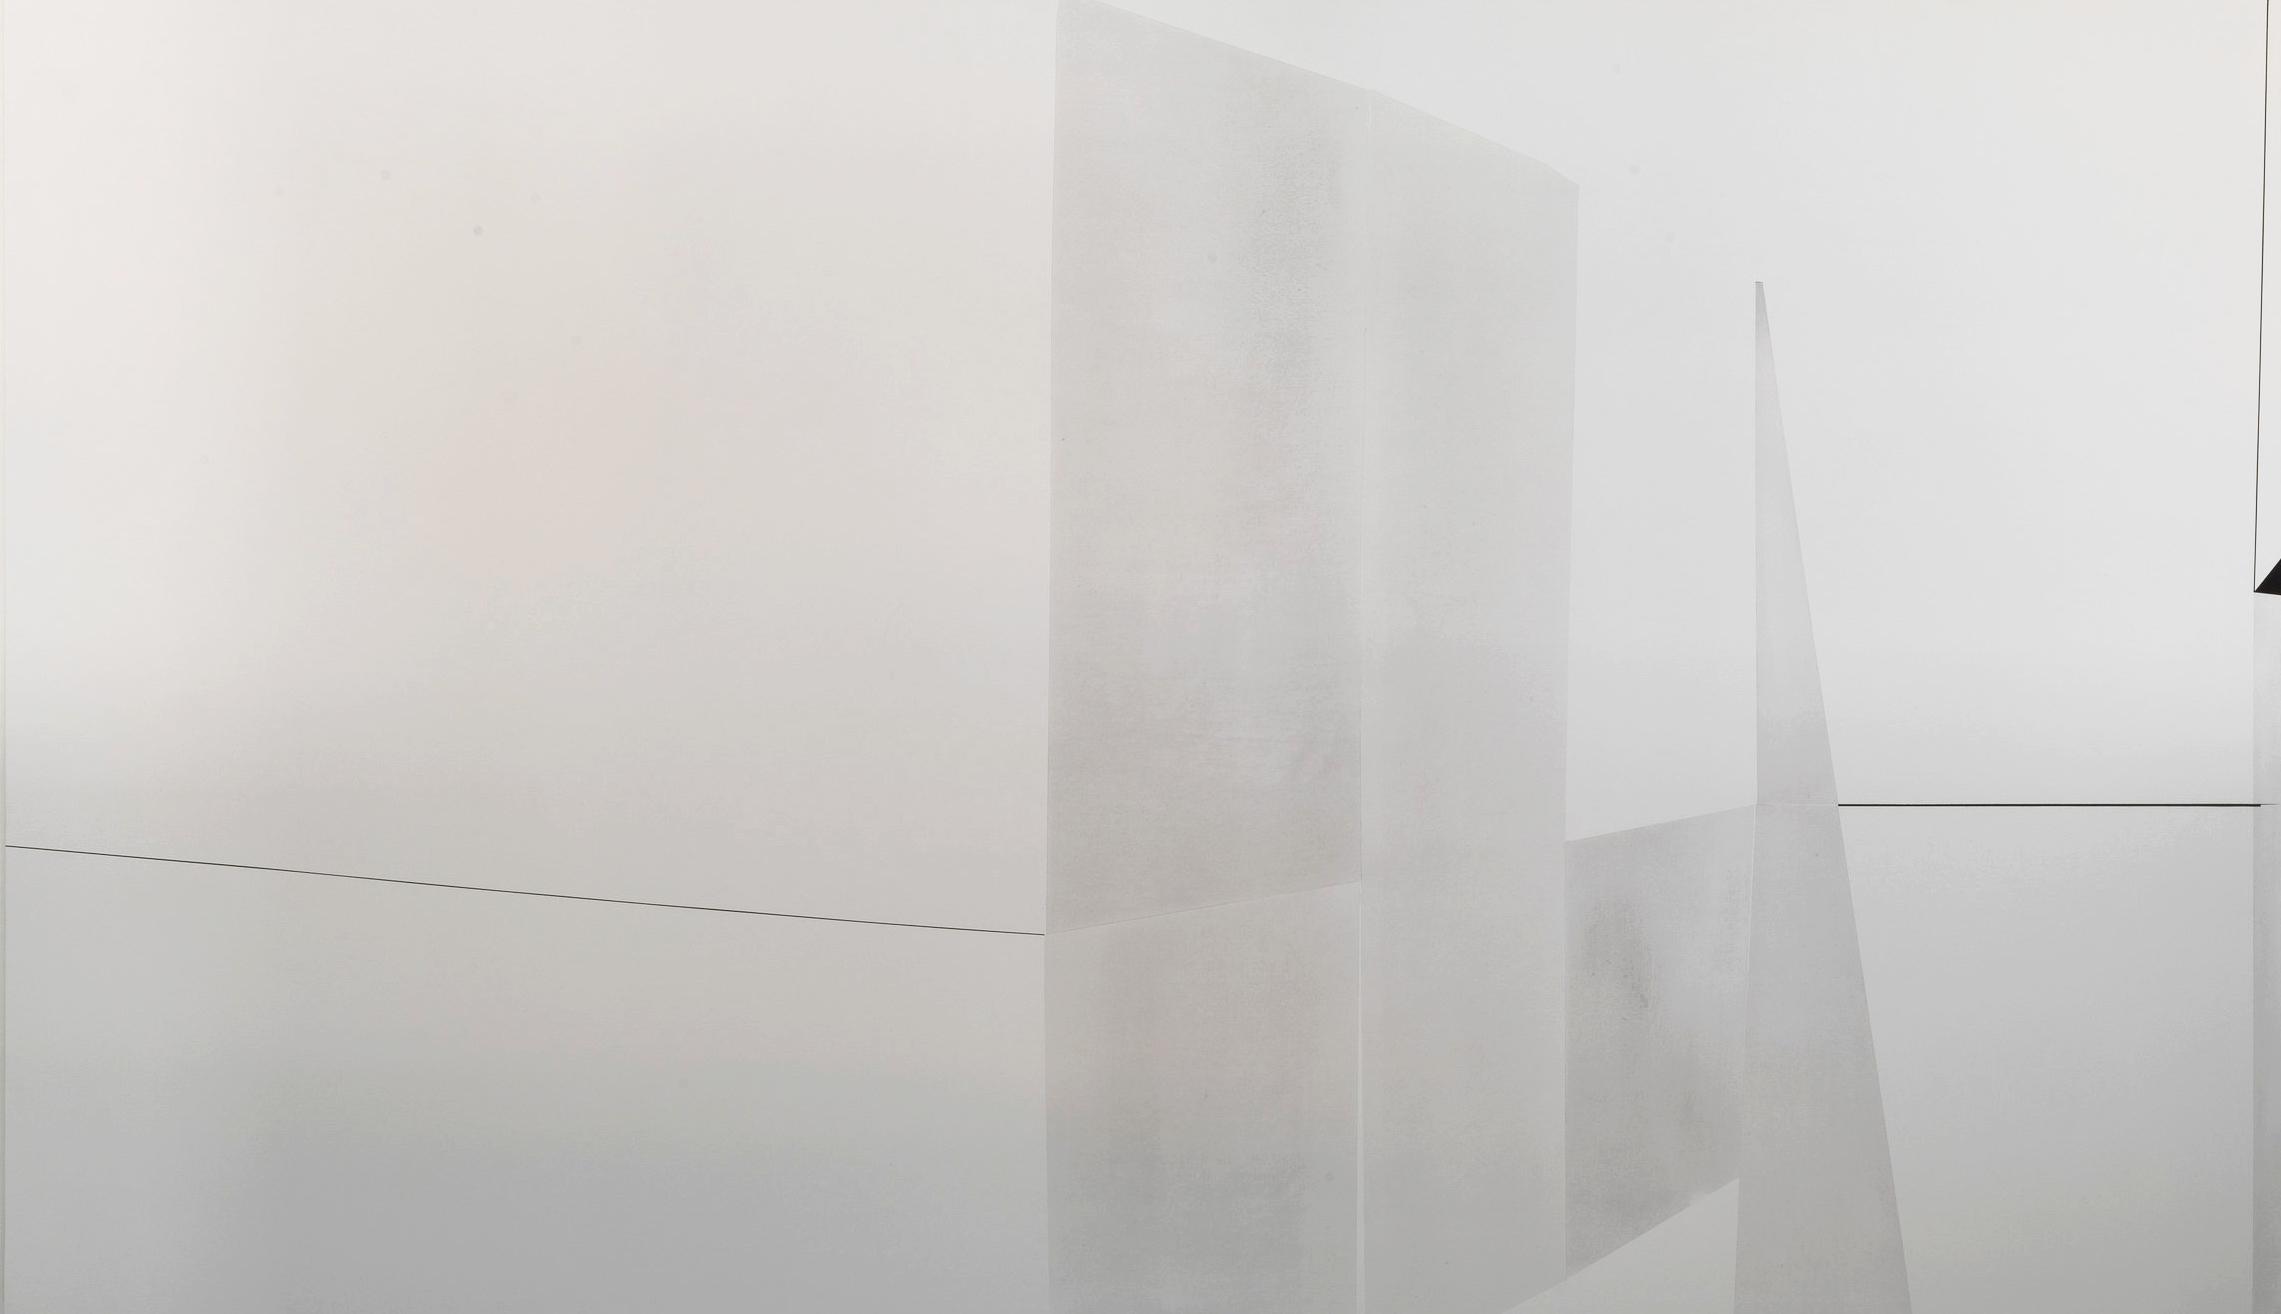 Martina Steckholzer, A Lent II, 2018, pigment on canvas, 140 x 240 cm